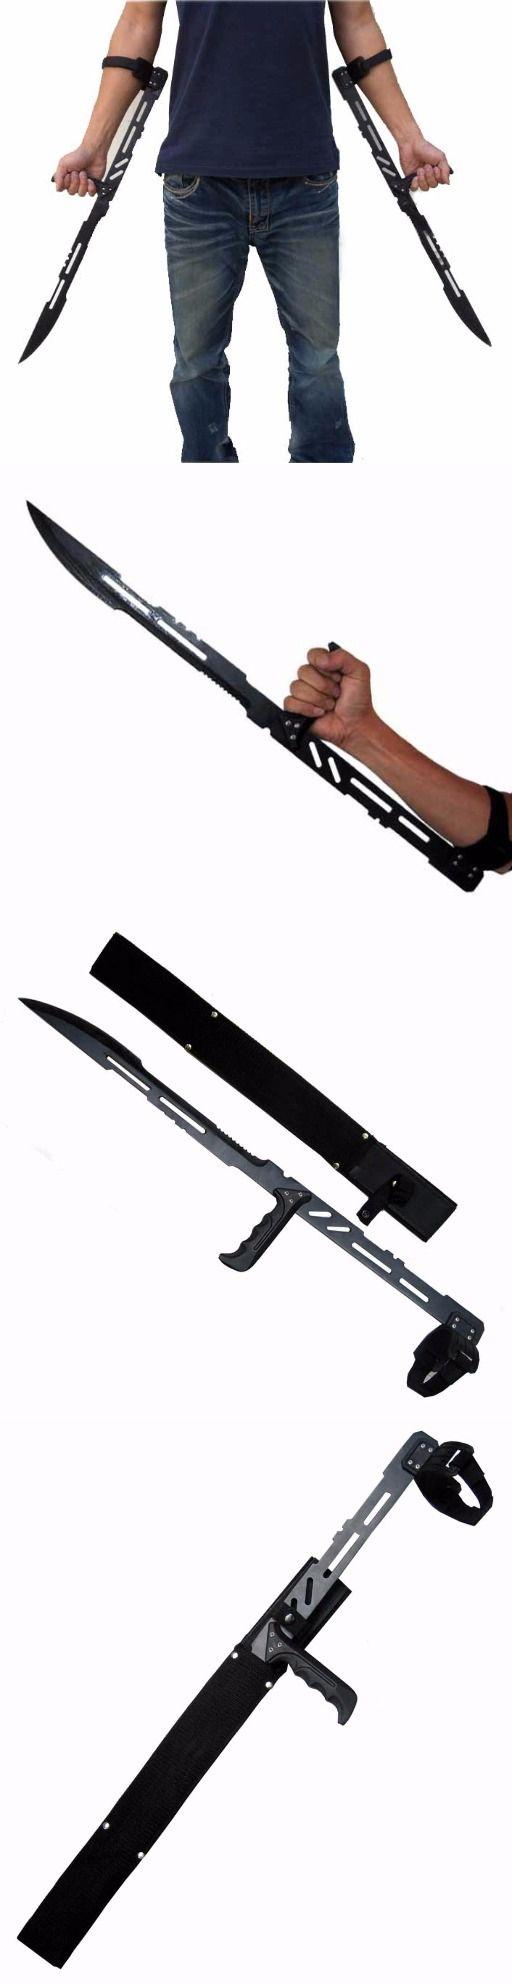 how to get ninja tools naruto online